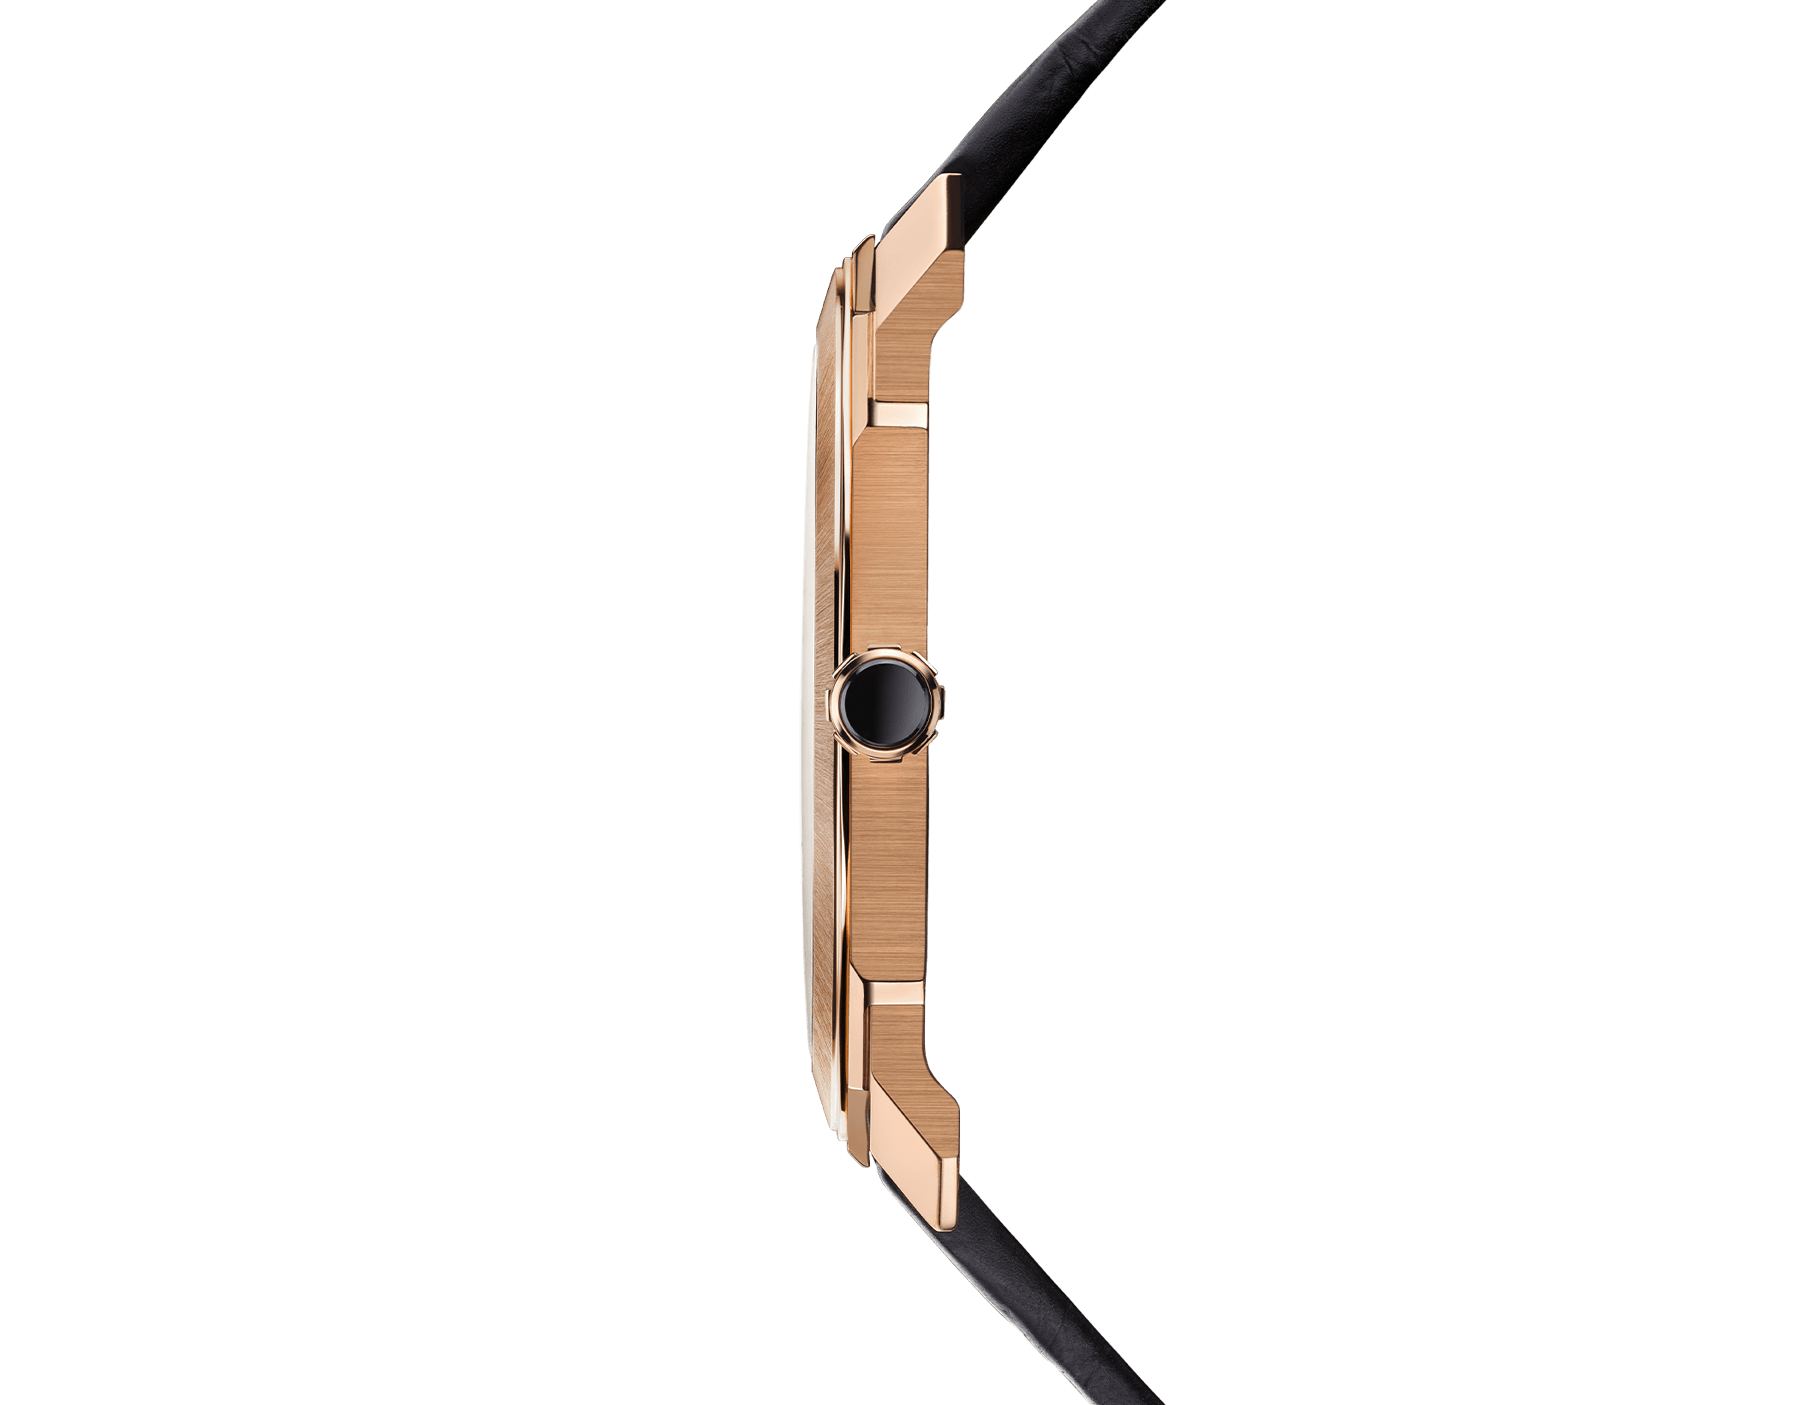 Octo Finissimo Automatic 超薄自動腕錶,搭載機械機芯,自動上鍊,鉑金微型自動盤,小秒針盤。18K 玫瑰金緞面拋光超薄錶殼,透明底蓋。黑色霧面錶盤,黑色鱷魚皮錶帶。防水深度 100 公尺。 103286 image 3